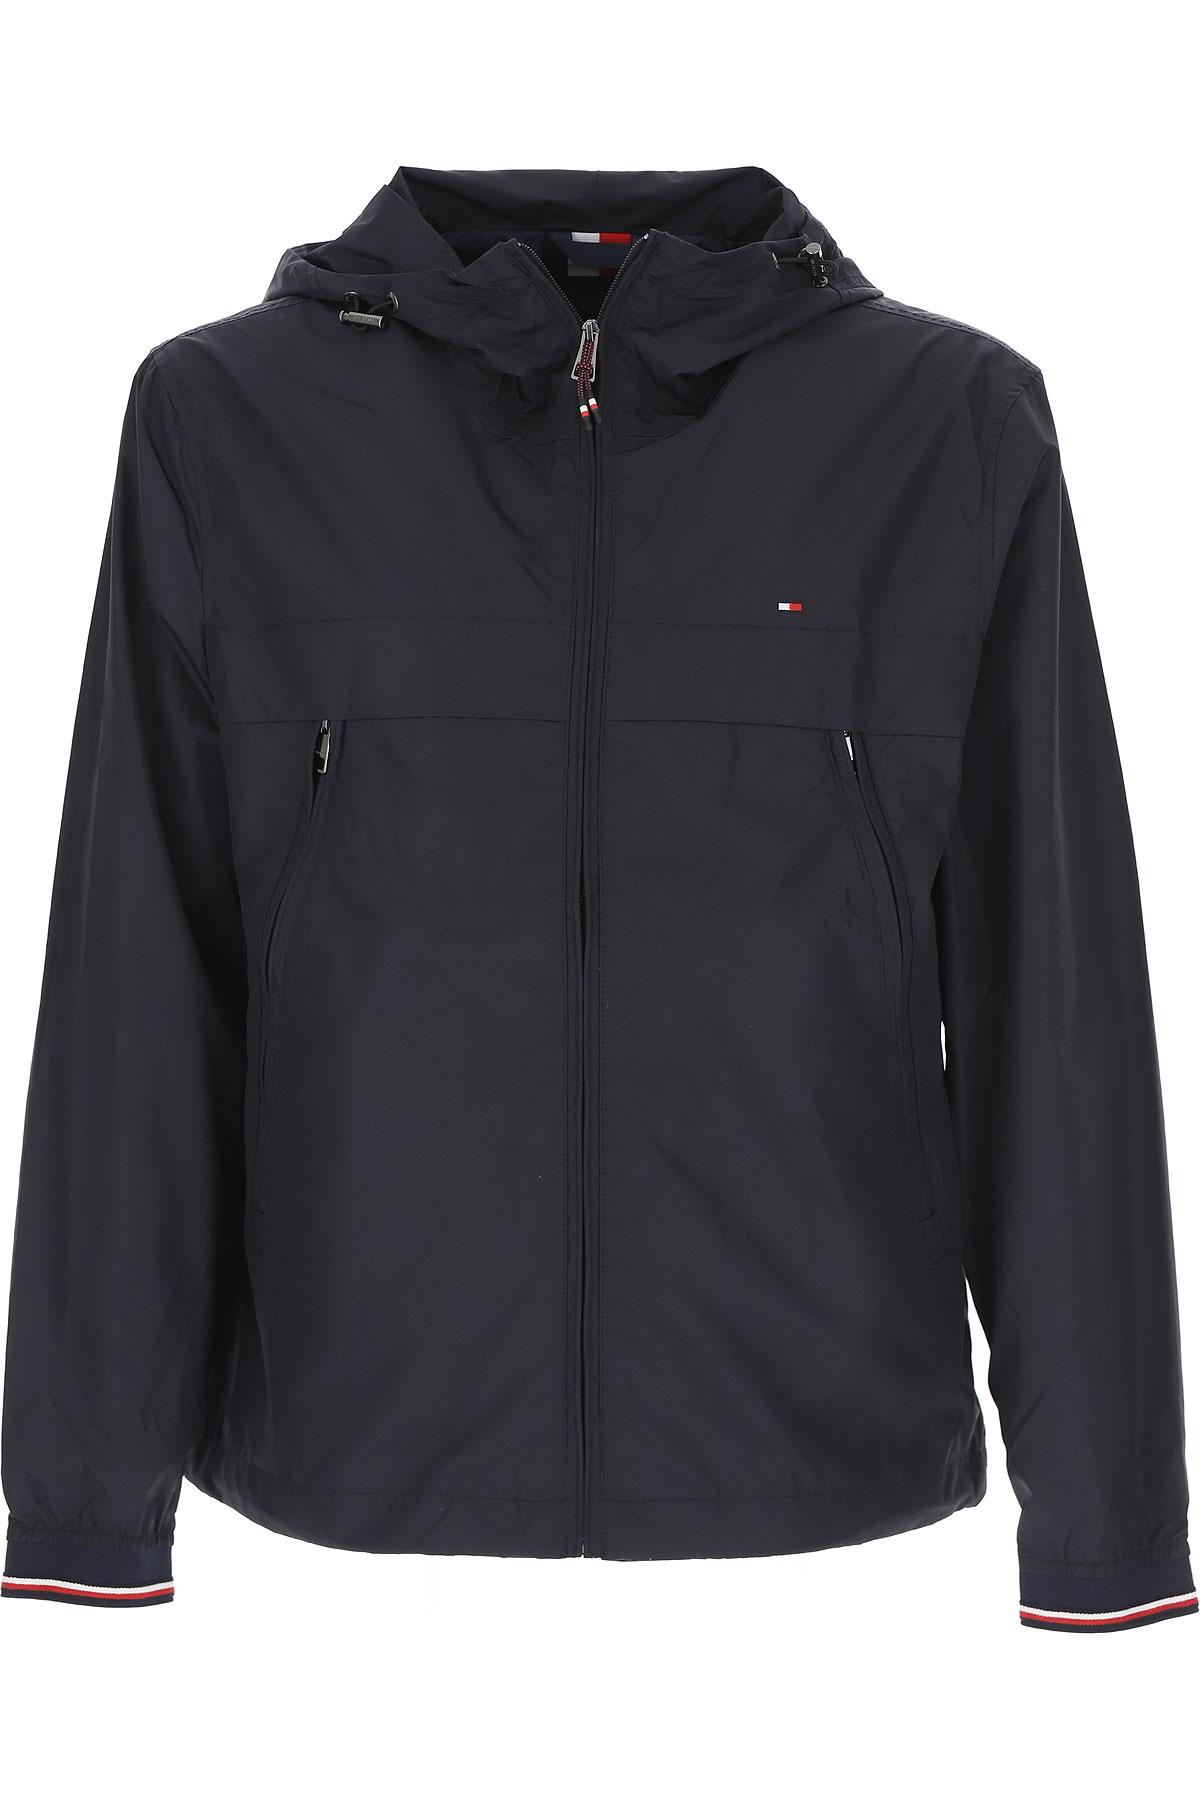 Tommy Hilfiger Jacket for Men On Sale, Navy Blue, polyestere, 2019, L M S XL